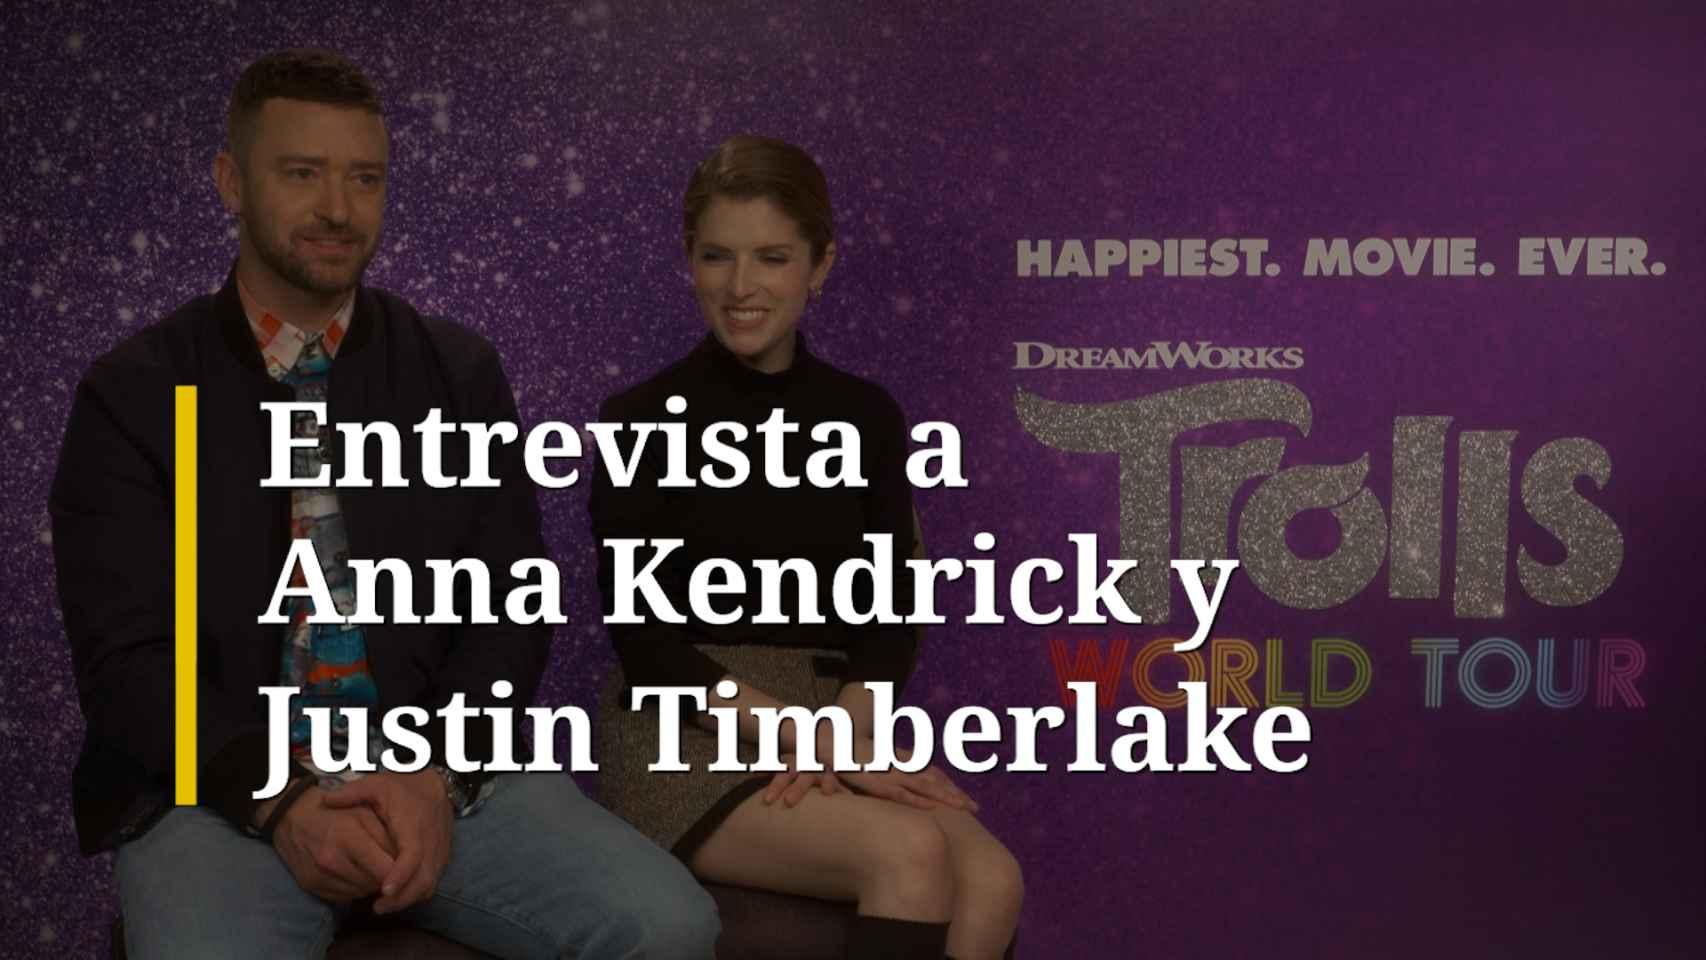 Entrevista a Anna Kendrick y Justin Timberlake